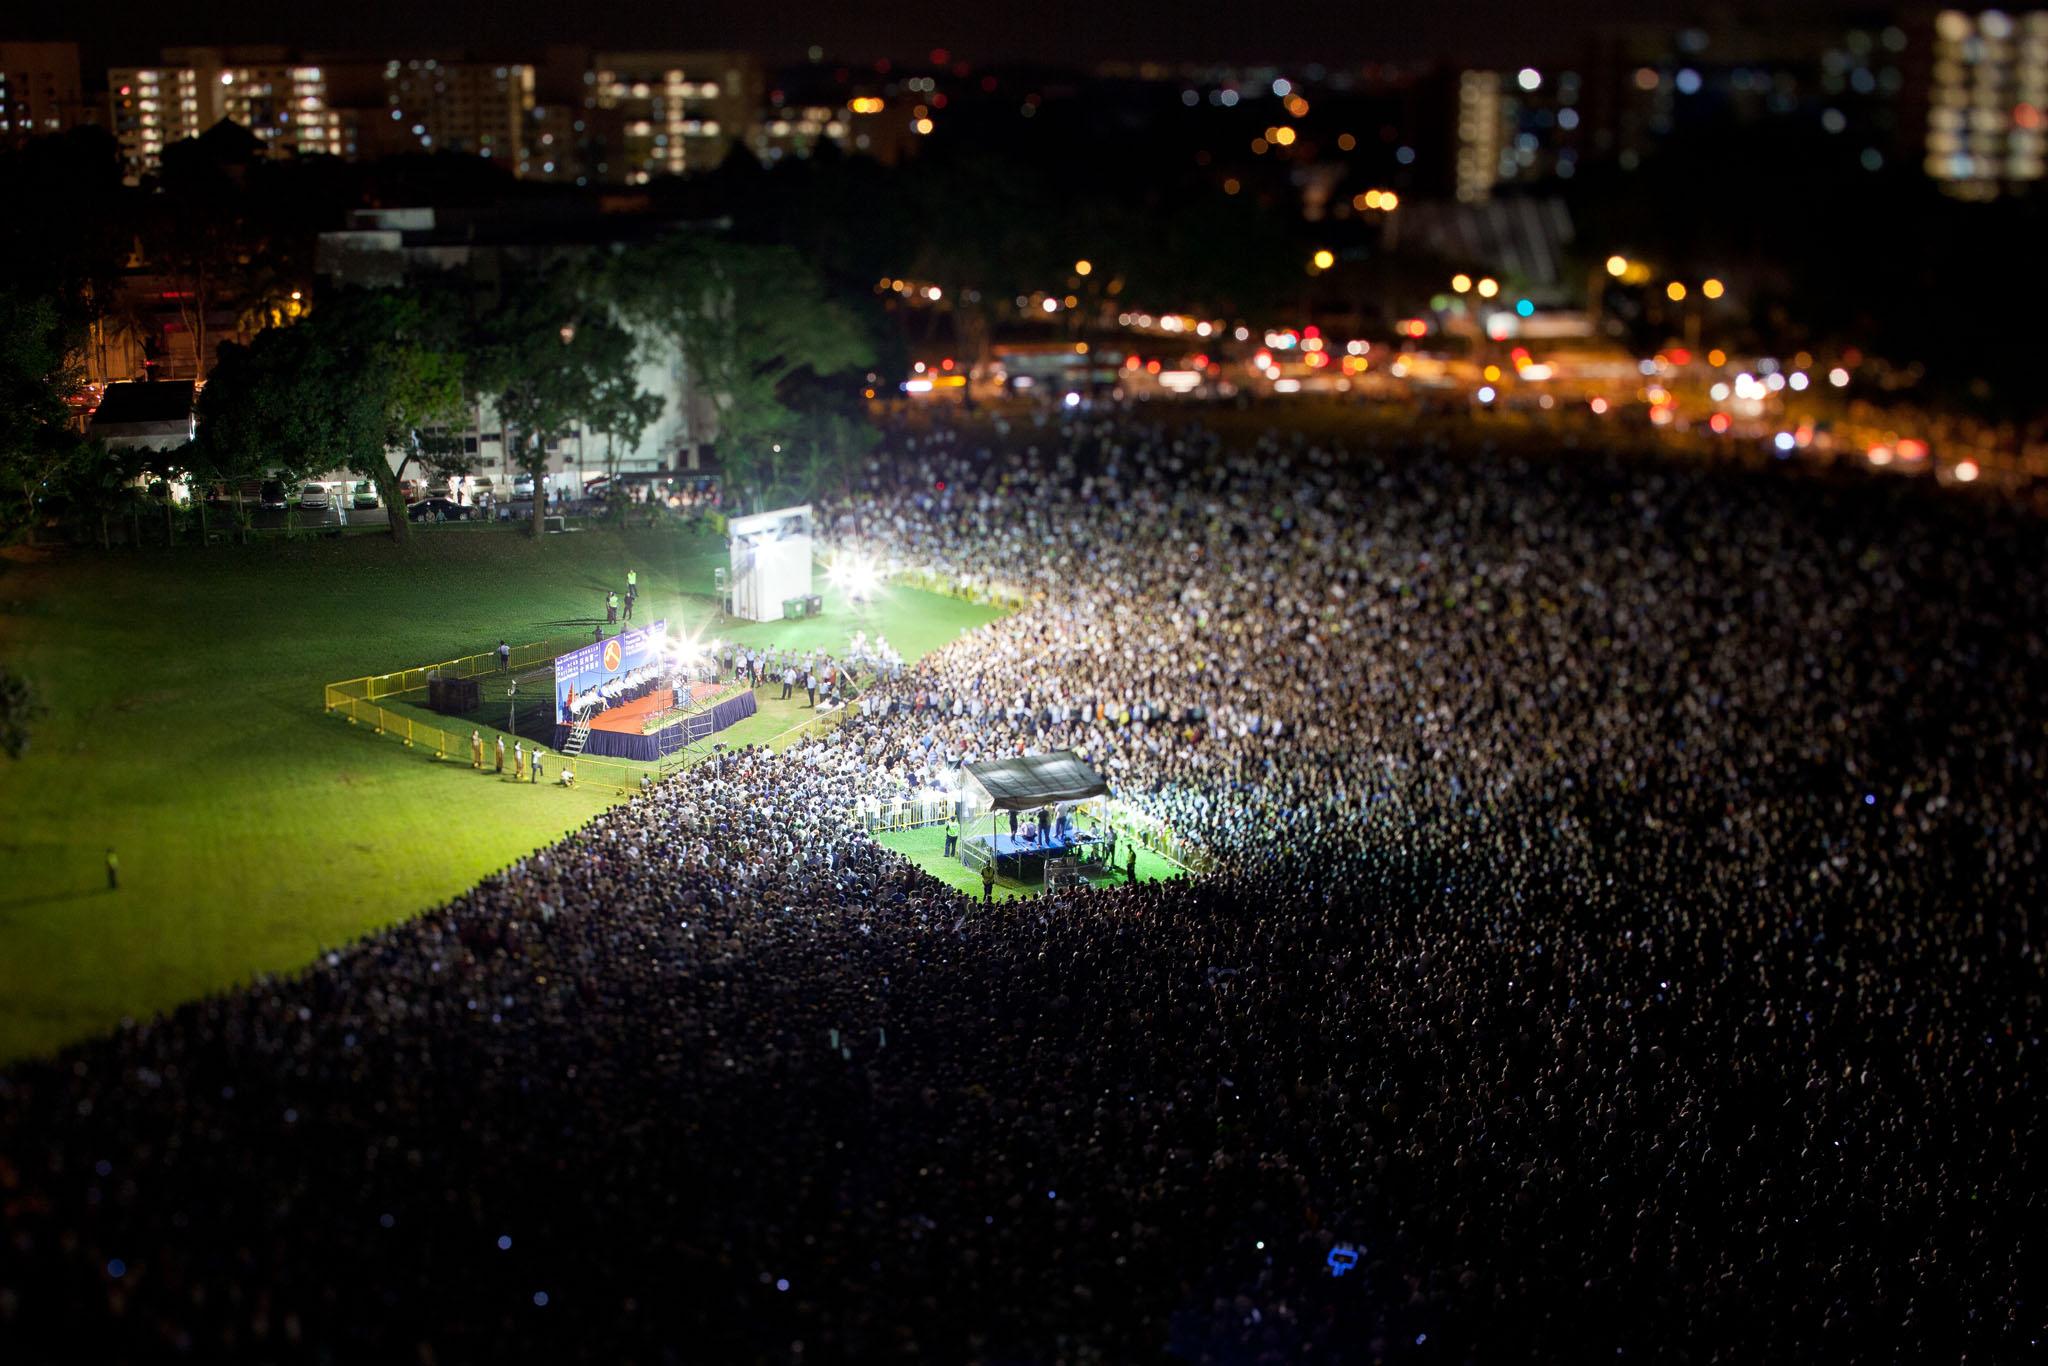 singapore-commercial-photographer-editorial-documentary-tiltshift-singaplural-zakaria-zainal-02.jpg